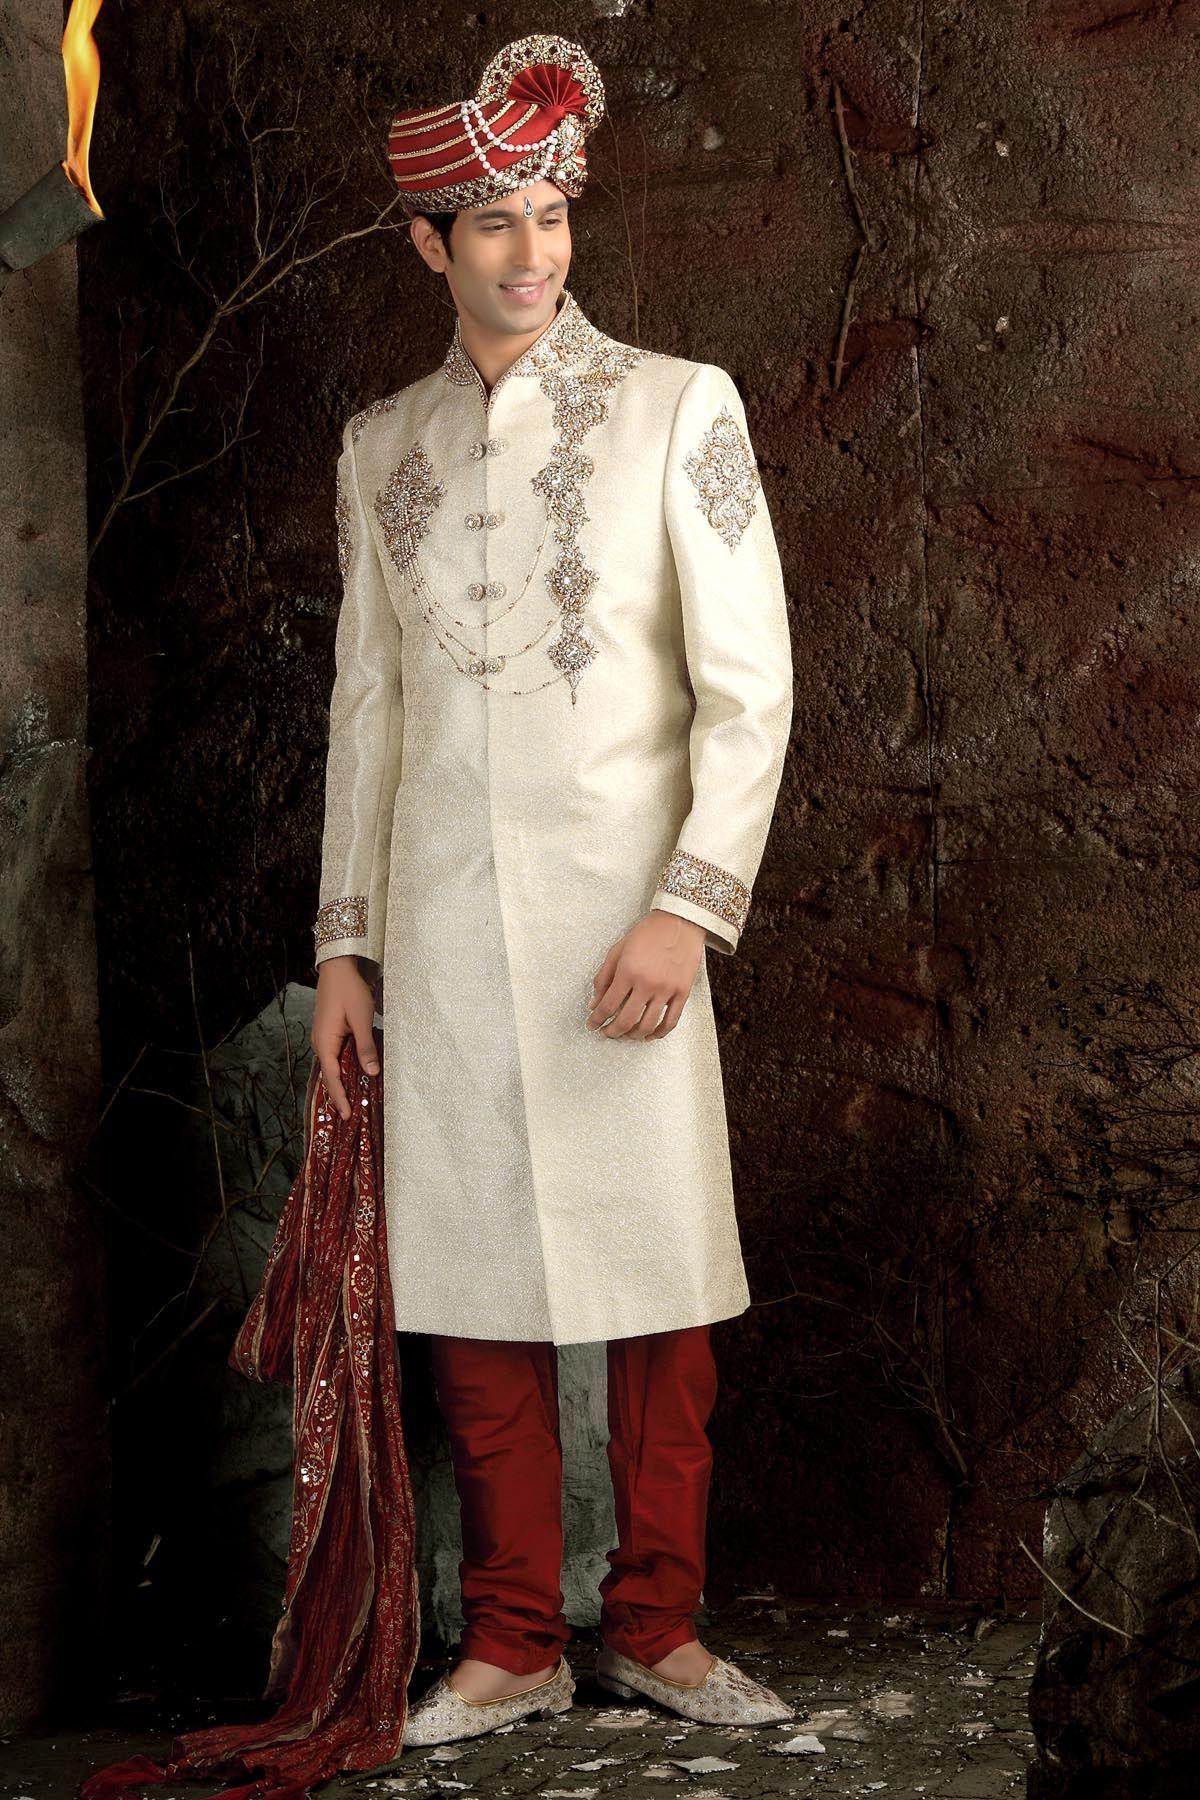 Mens Indian Dress Wedding Indianfashion Indian Wedding Dress Gents Wedding Dress Informal Wedding Dresses [ 1800 x 1200 Pixel ]